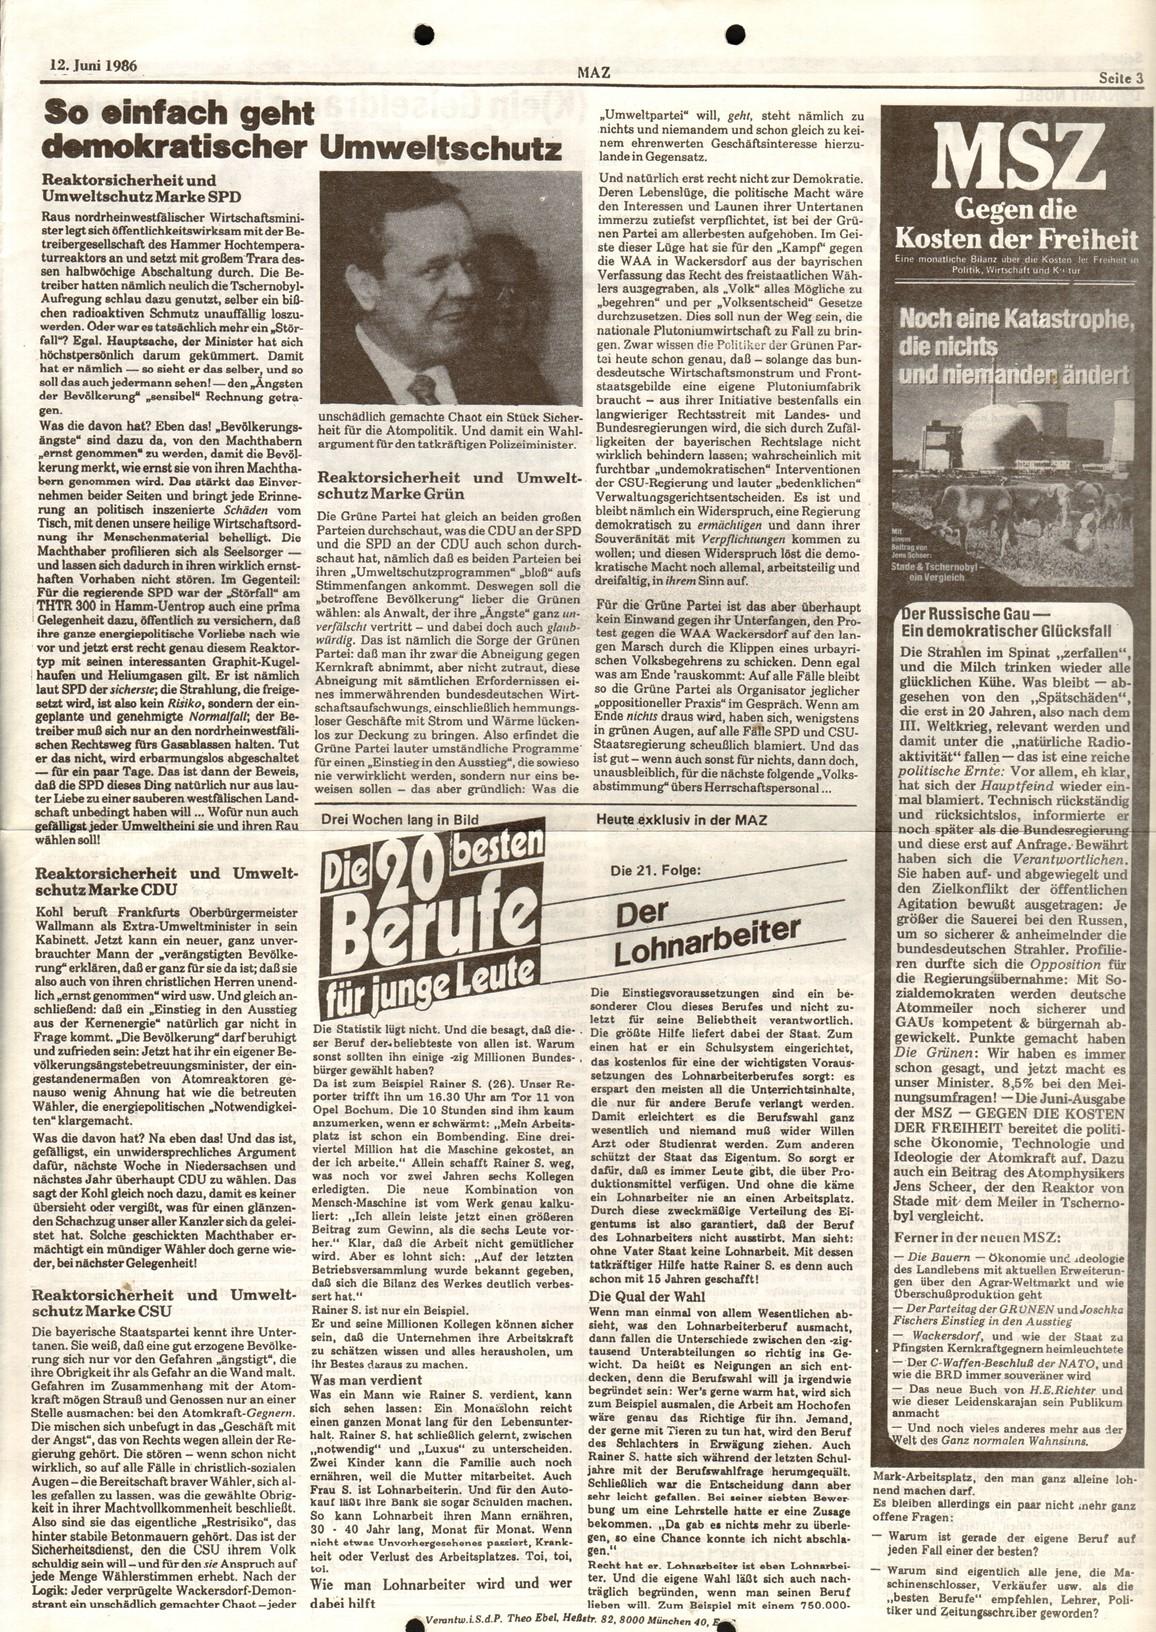 Fuerth_MG_MAZ_Dynamit_Nobel_19860612_03